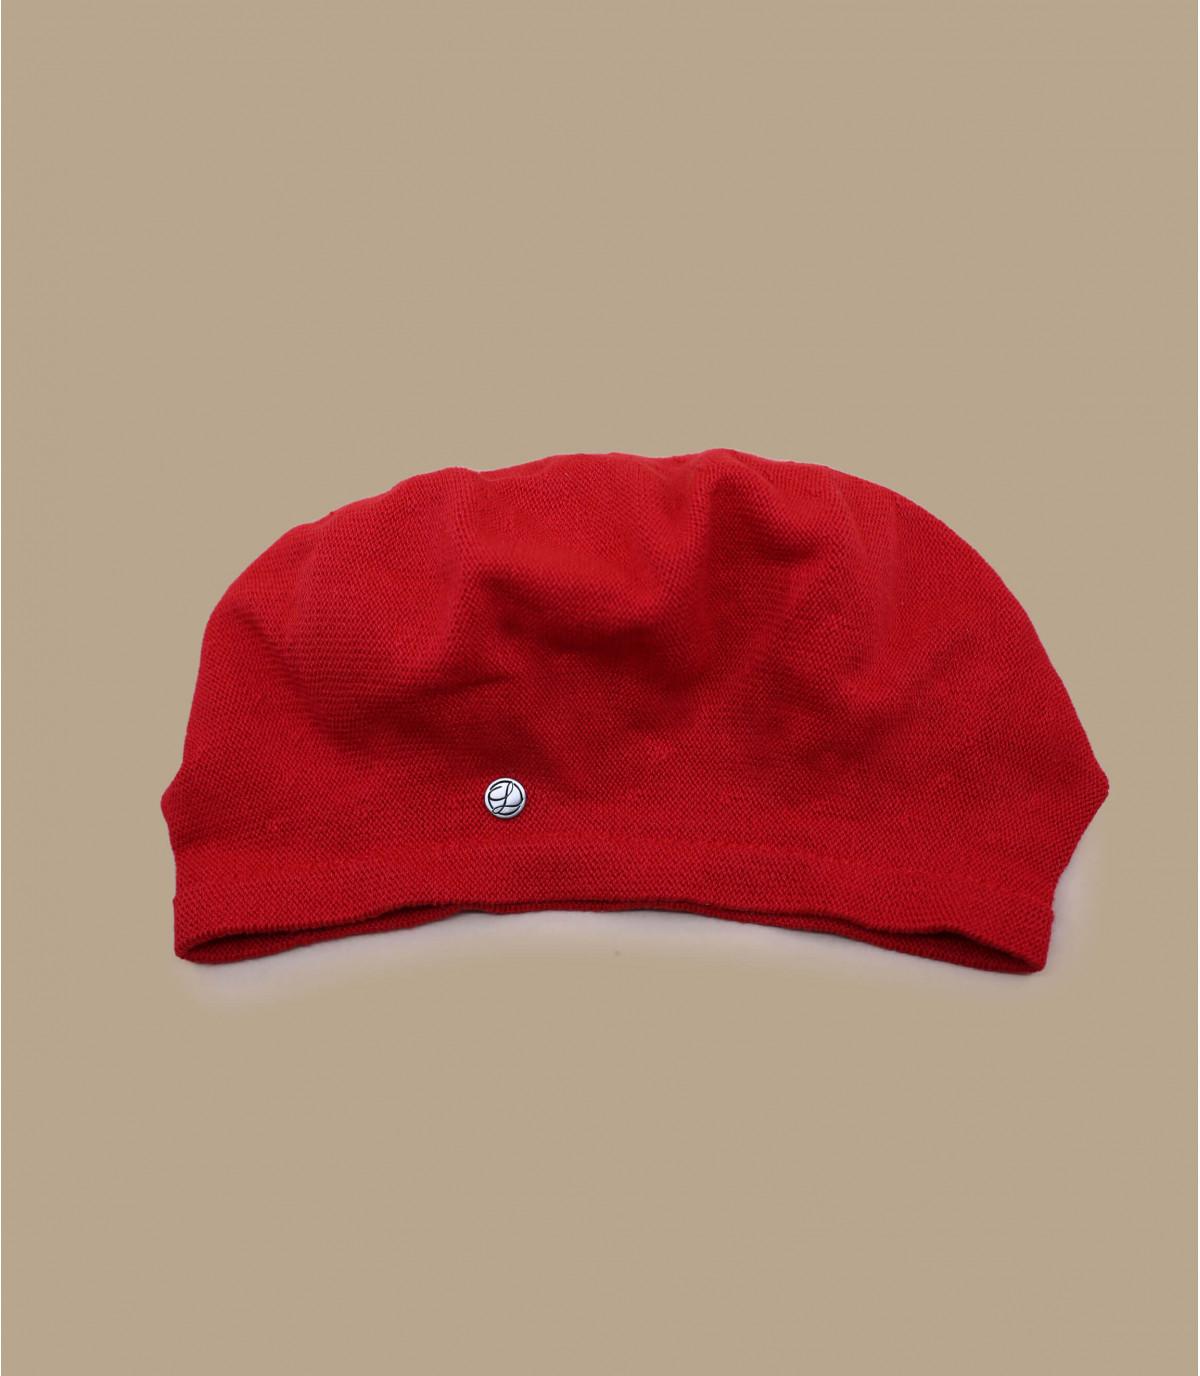 Dettagli Belza red - image 2